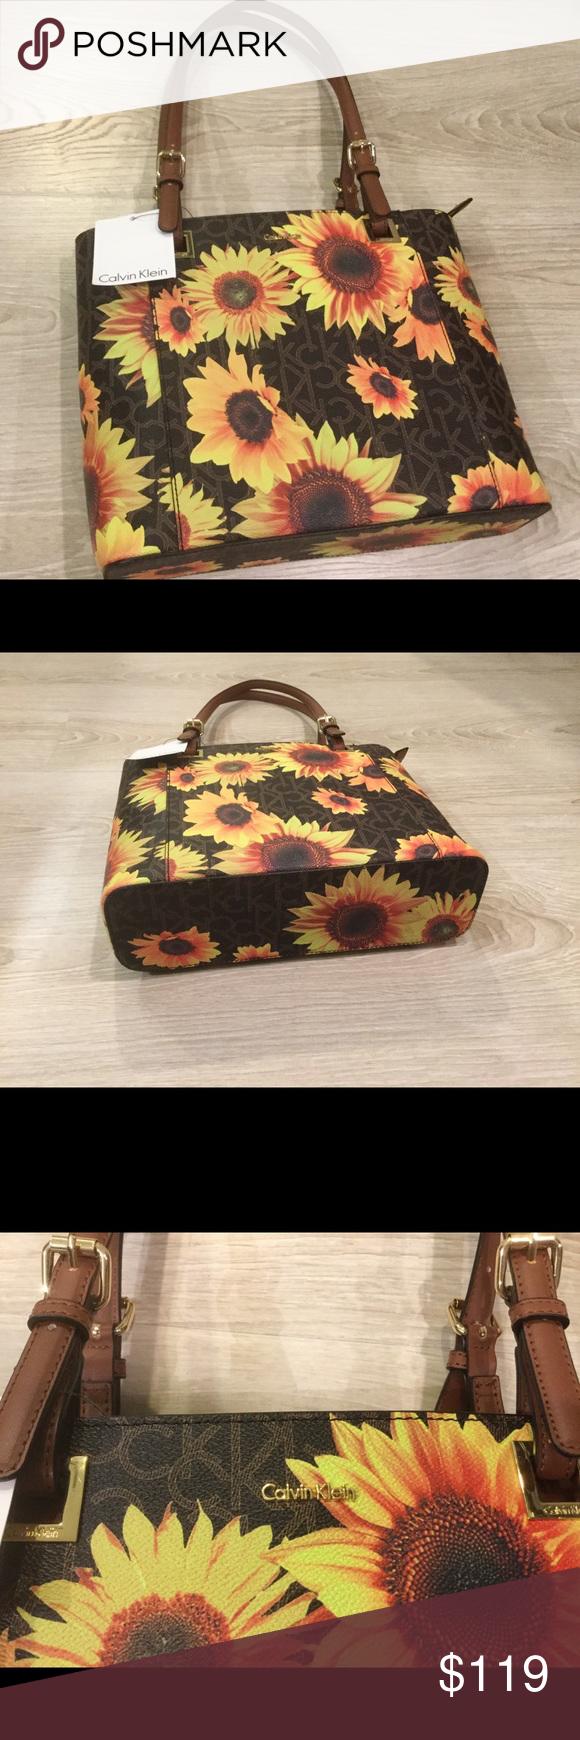 7072f7bcf14 NWT Calvin Klein Sunflower Tote Bag Authentic NWT Calvin Klein Sunflower  Tote Bag Calvin Klein Bags Totes